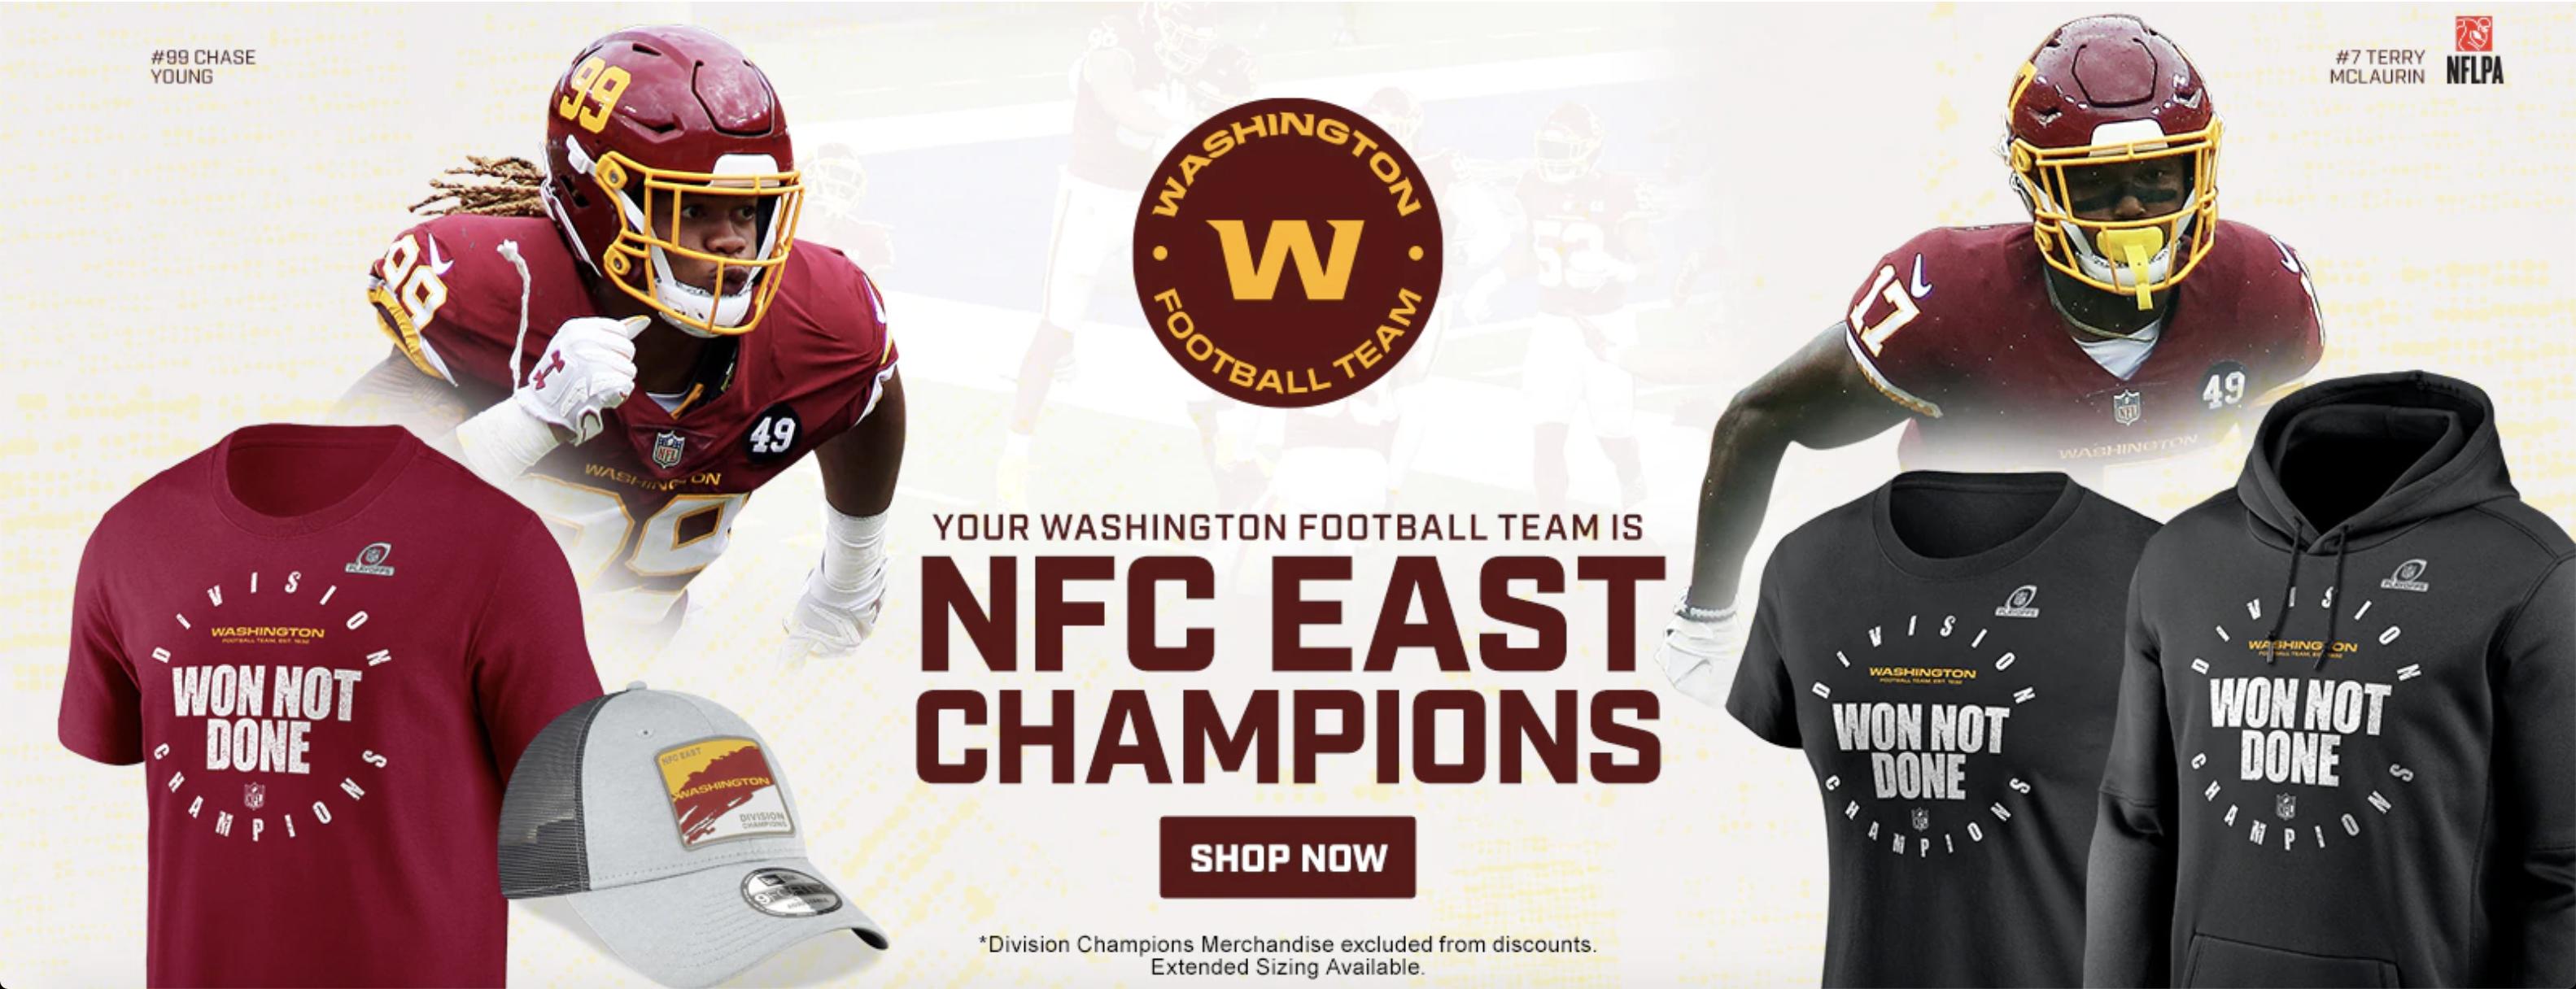 Fanatics_Playoffs_Merchandise_Won_Not_Done